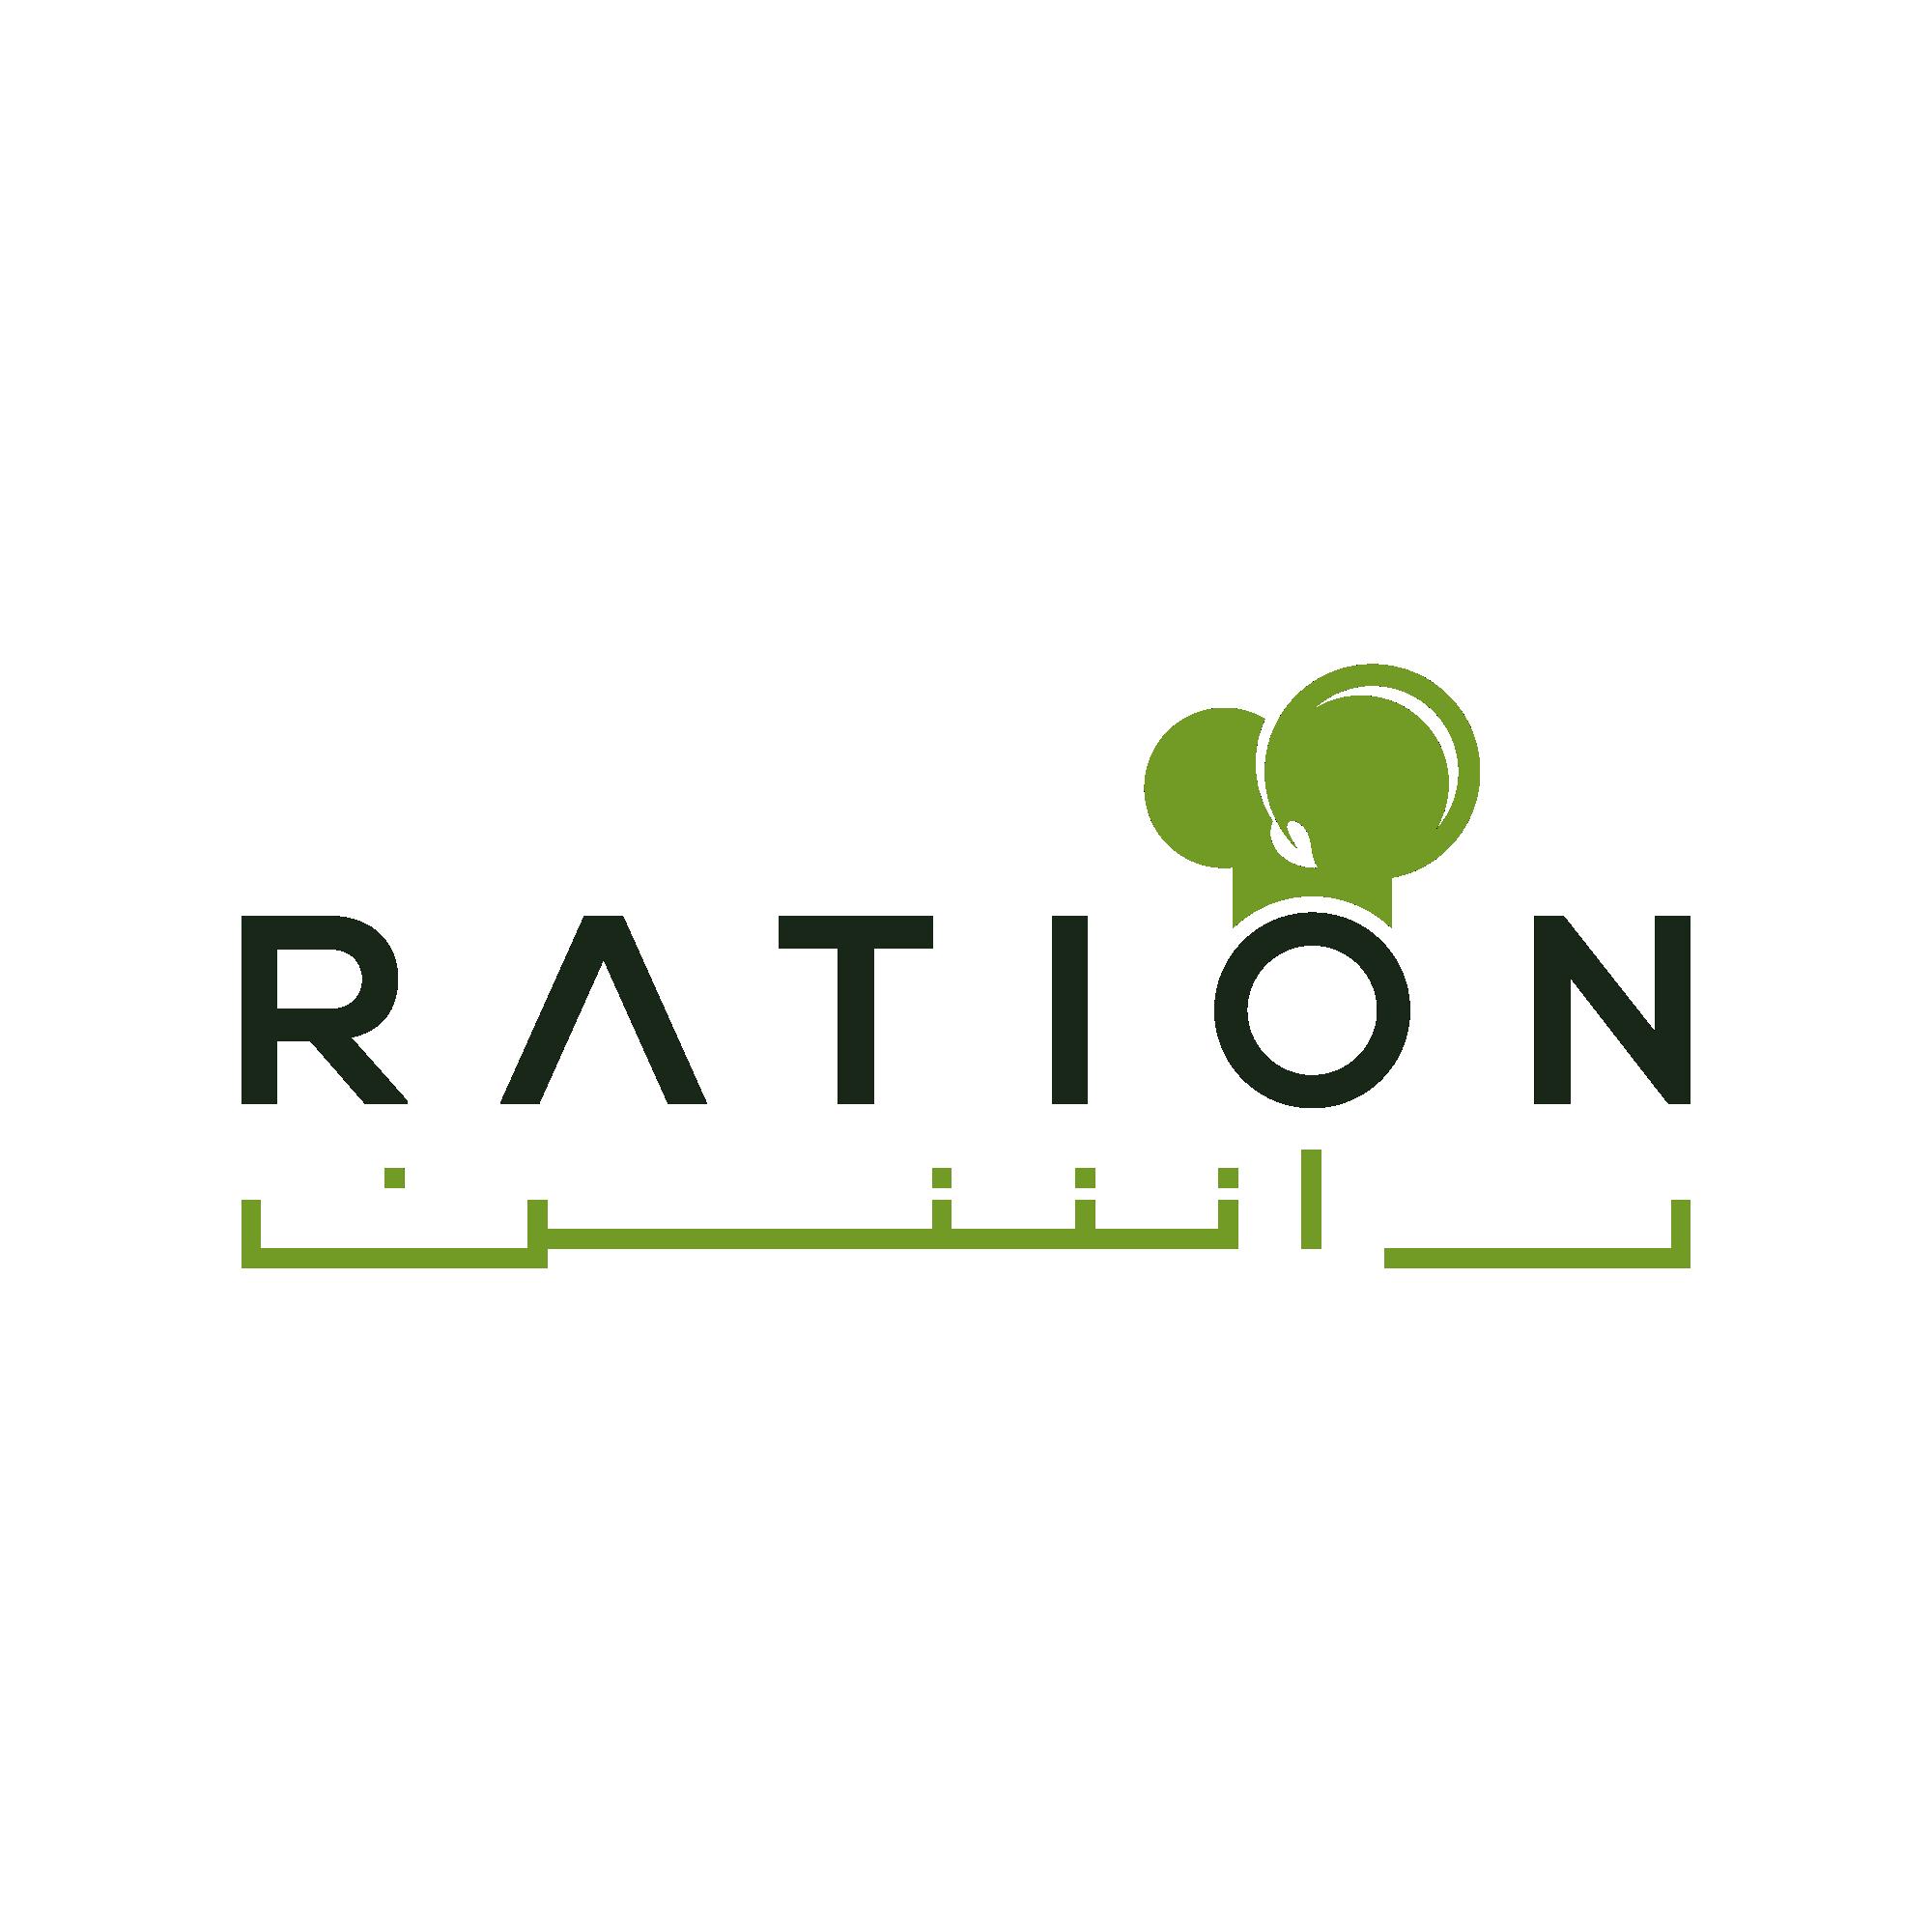 Design a logo for a future restuarant